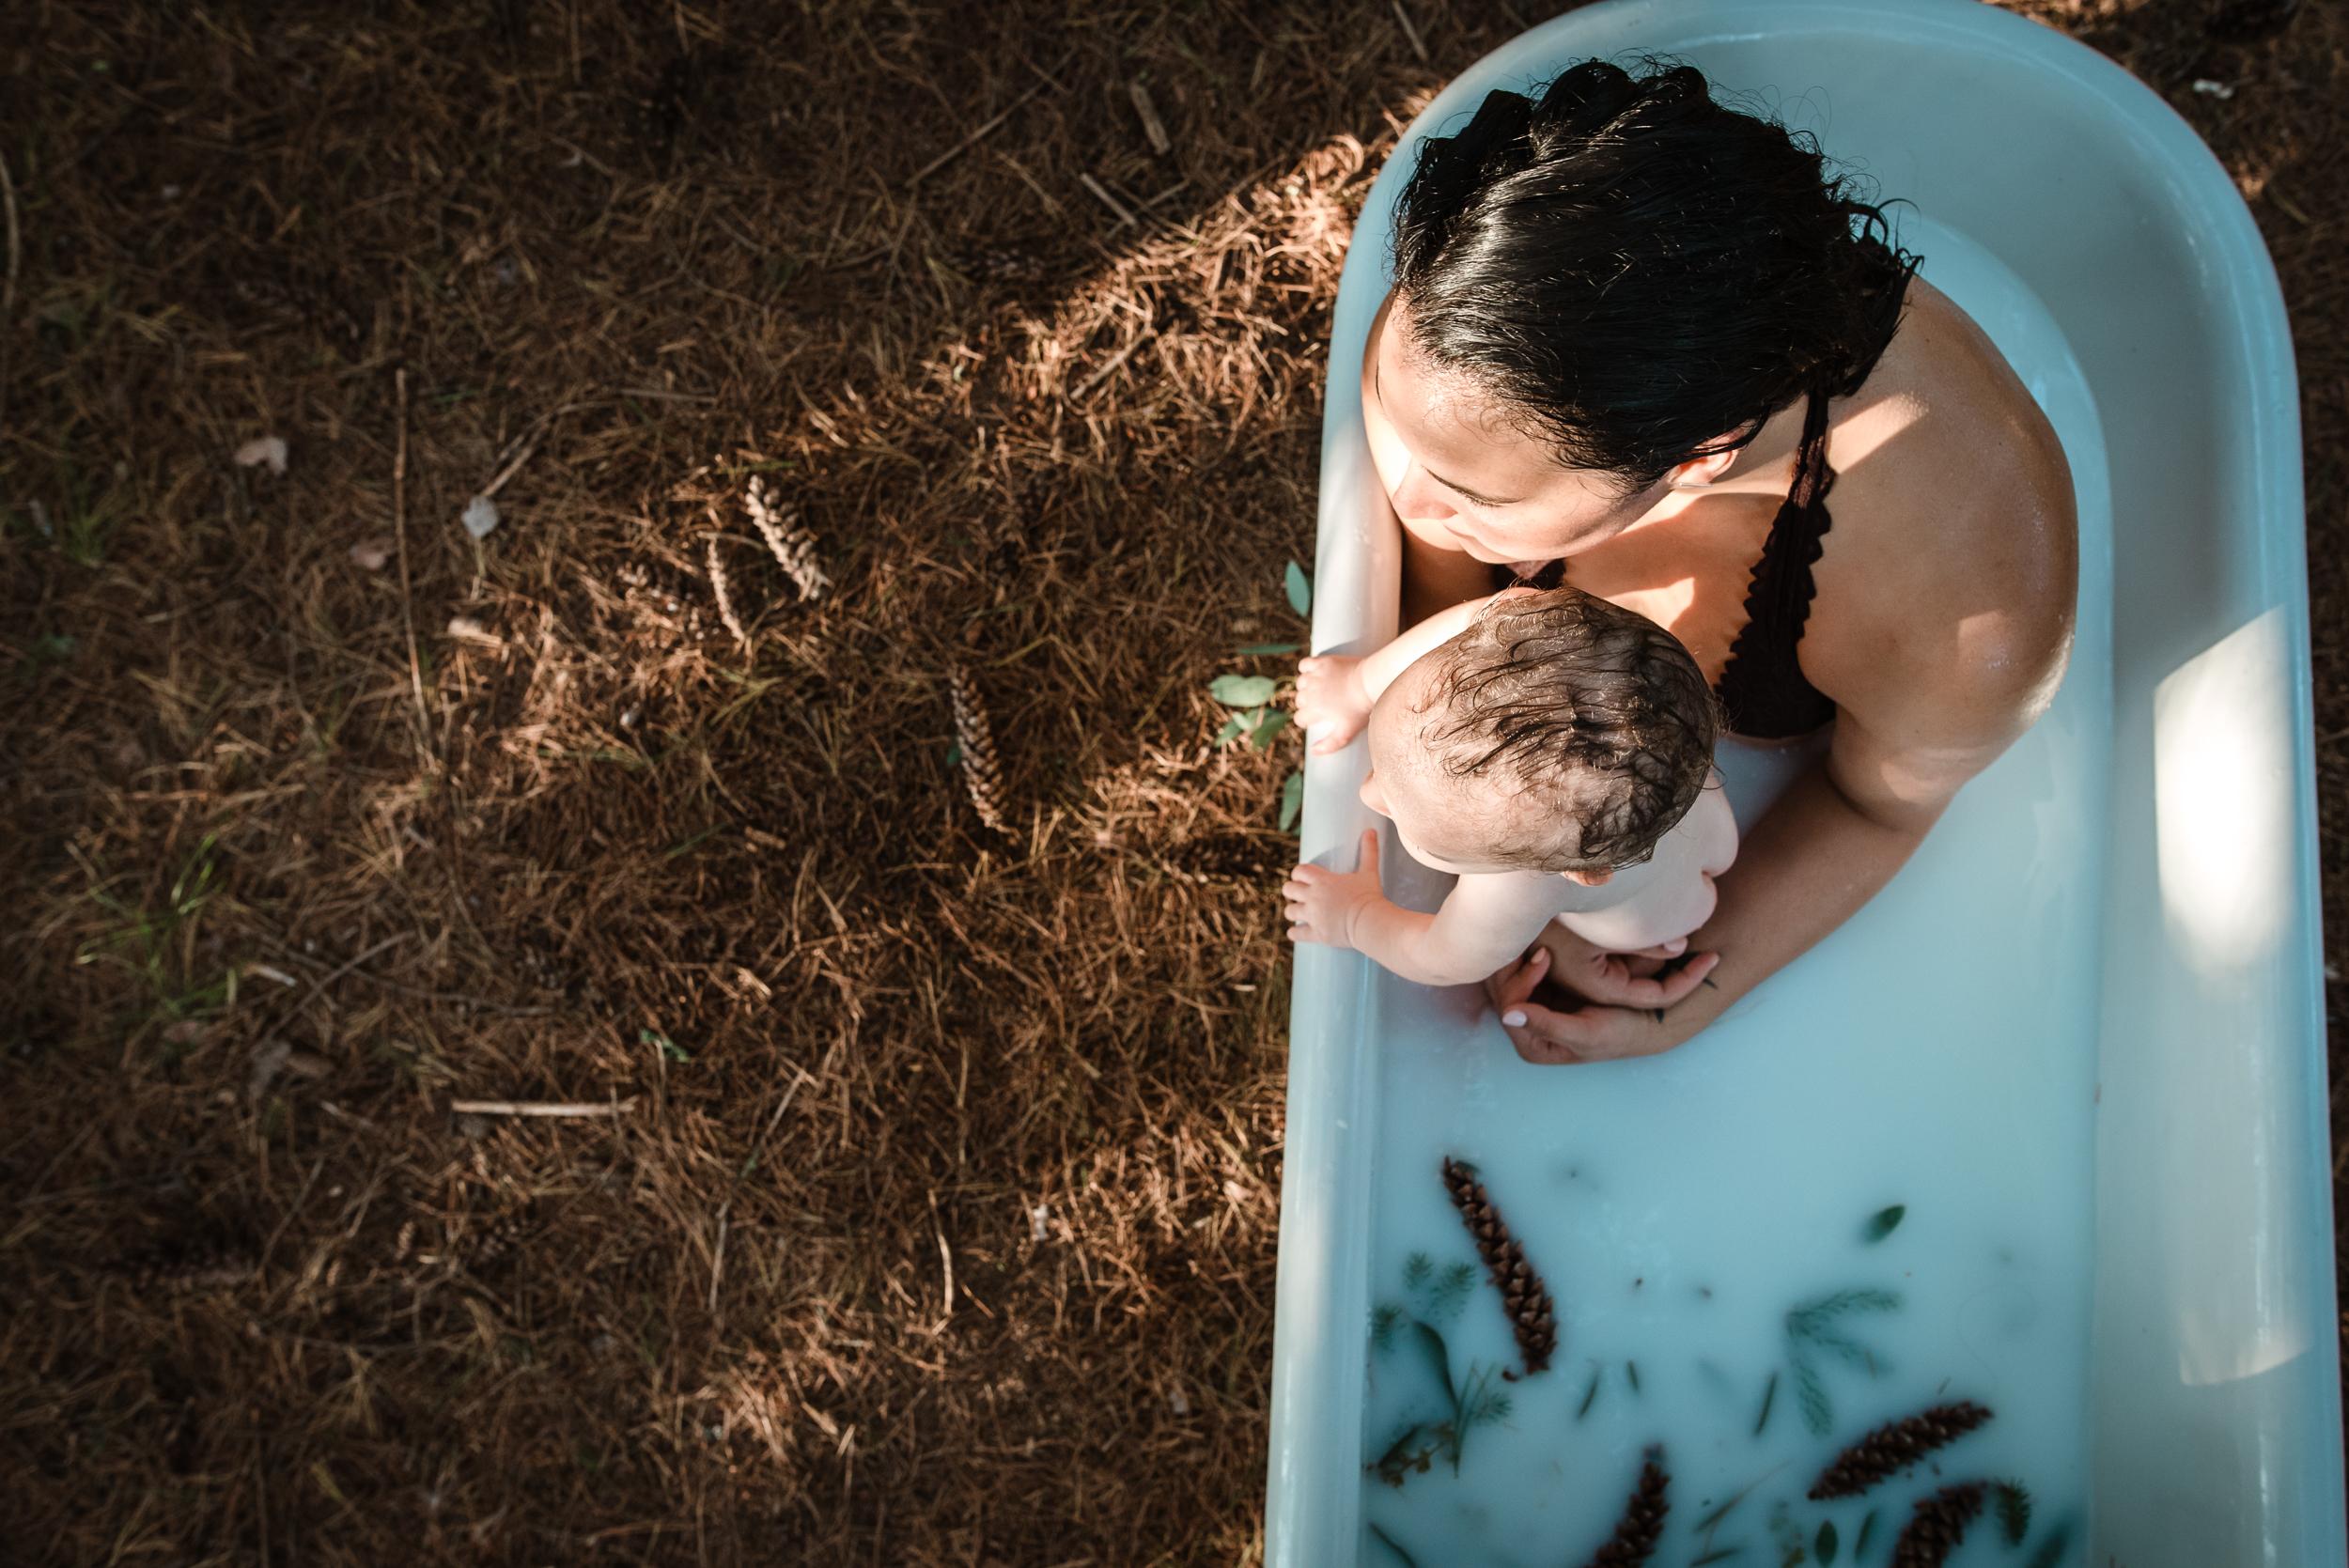 Best Birth Photography Minneapolis St. Paul Minnesota Meredith Westin Postpartum Breastfeeding Motherhood-September 12, 2018-182221.jpg